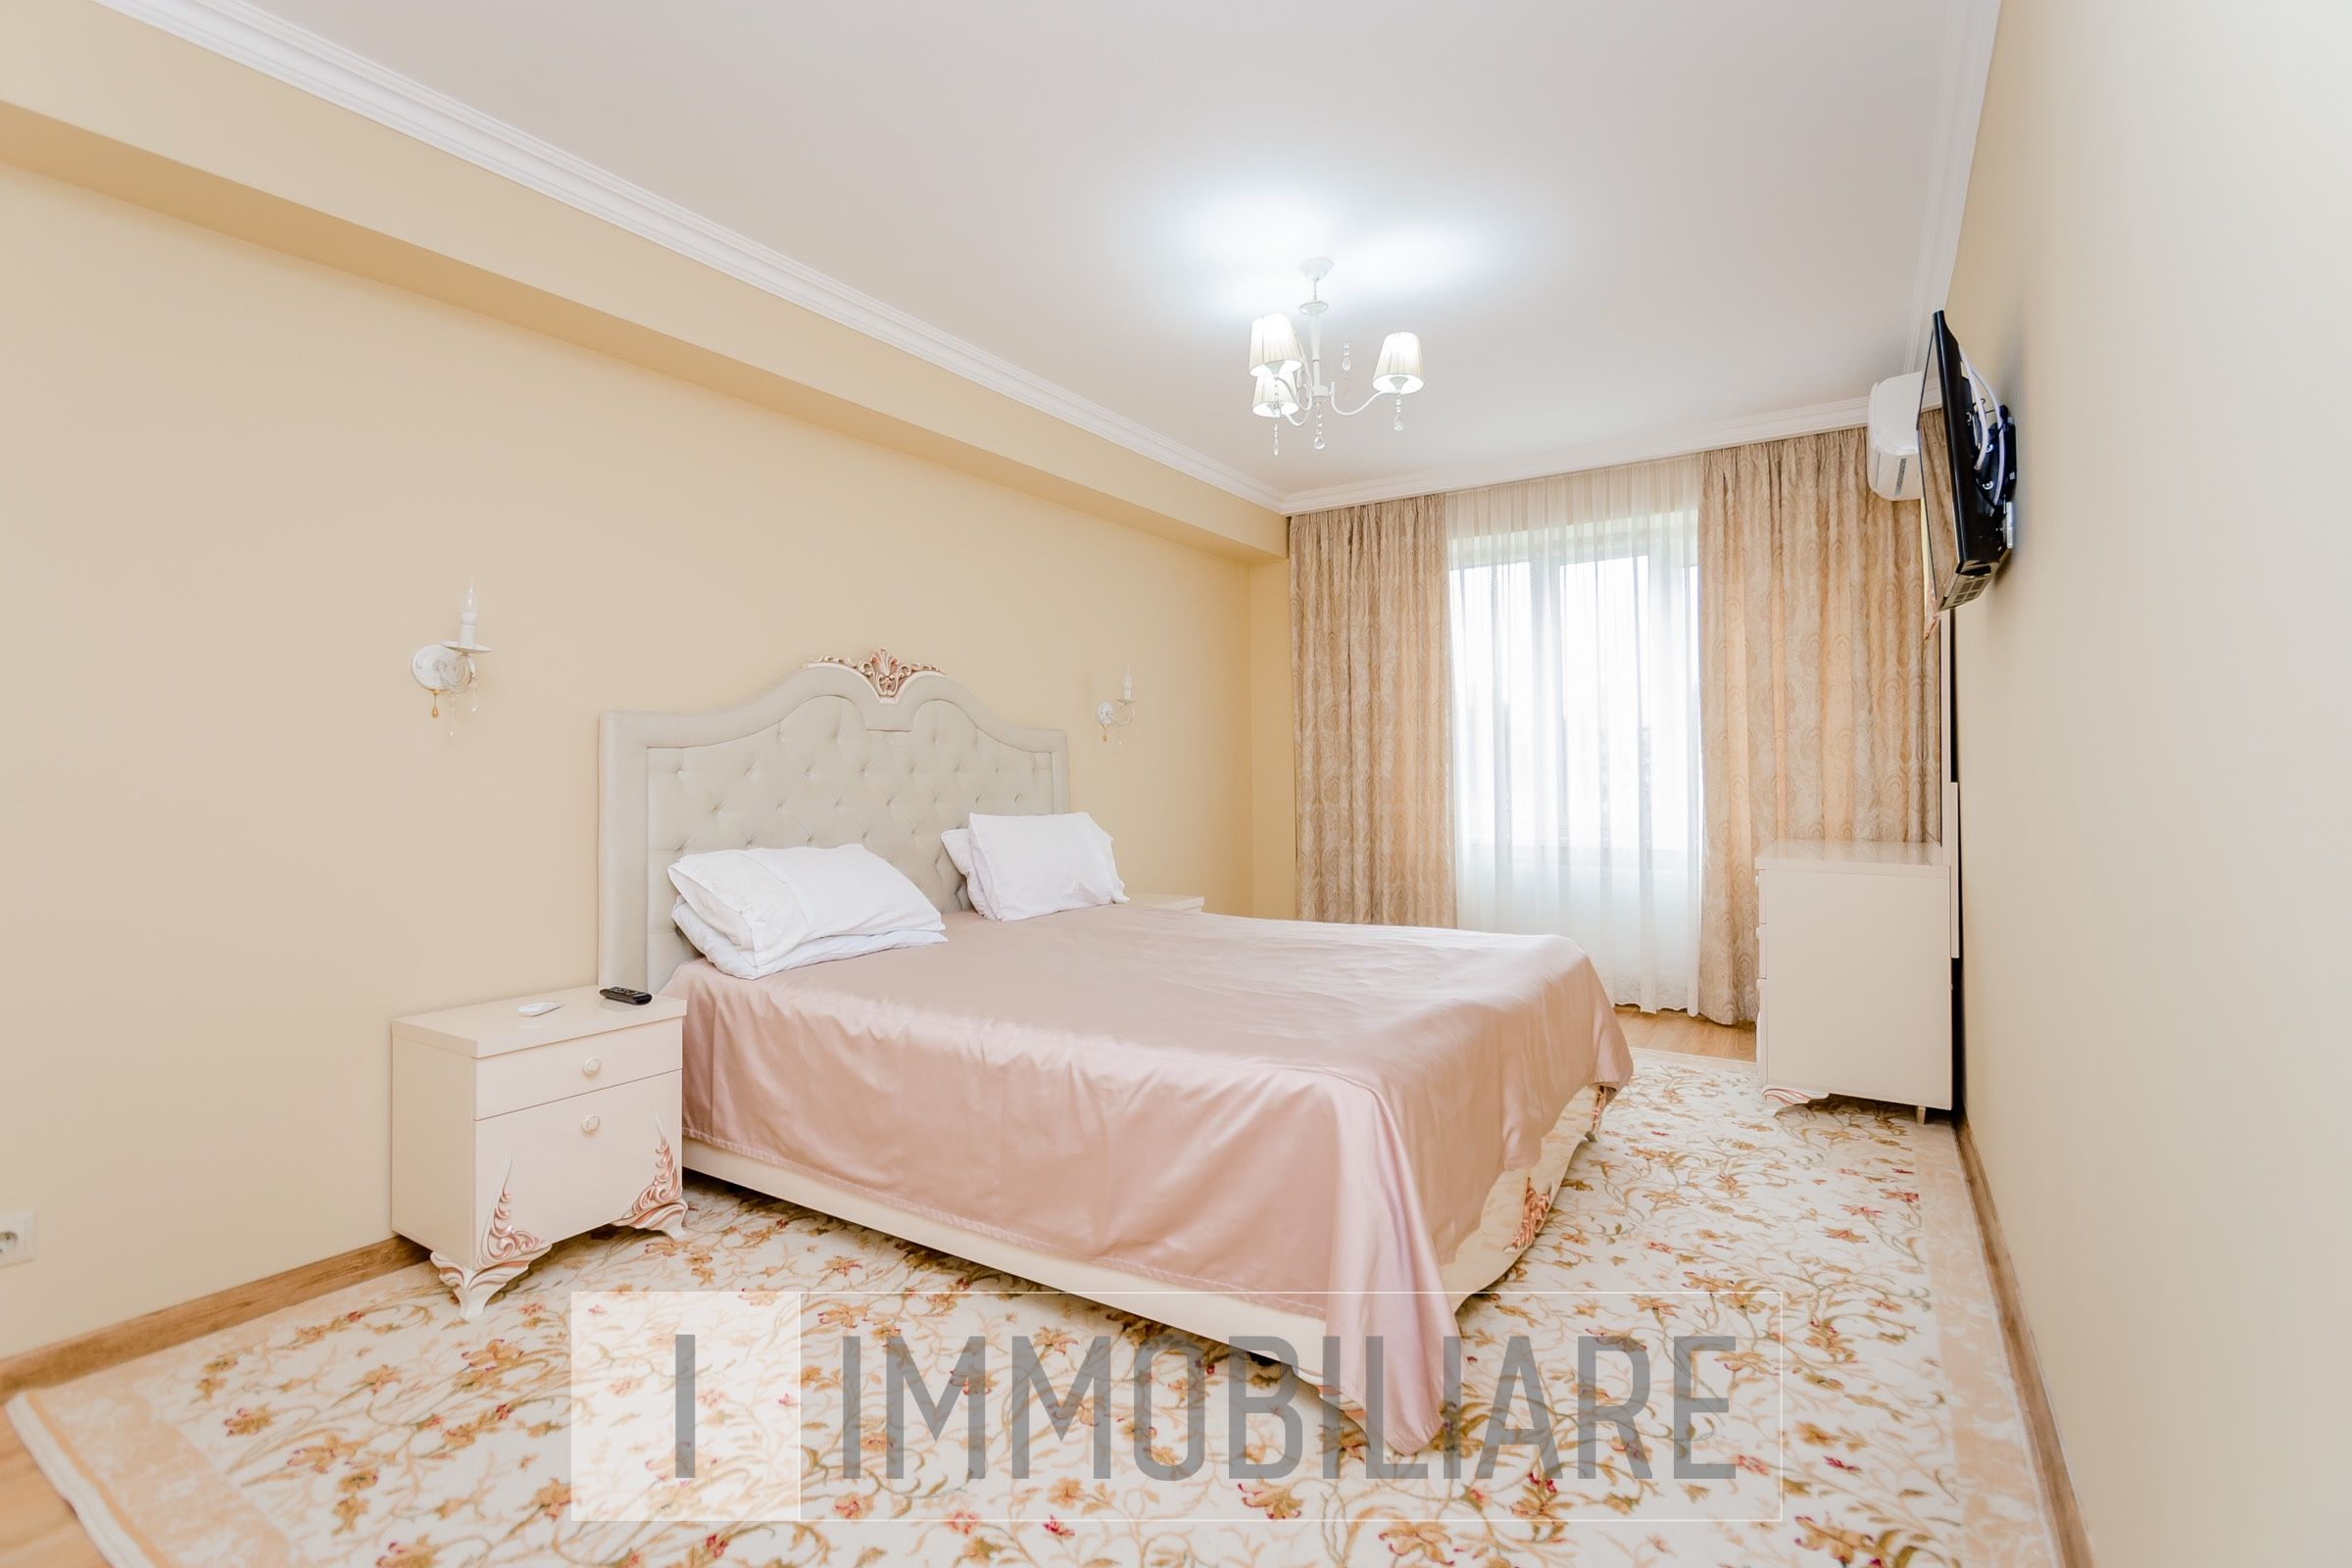 Apartament cu 3 camere+living, sect. Botanica, str. Botanica Veche.